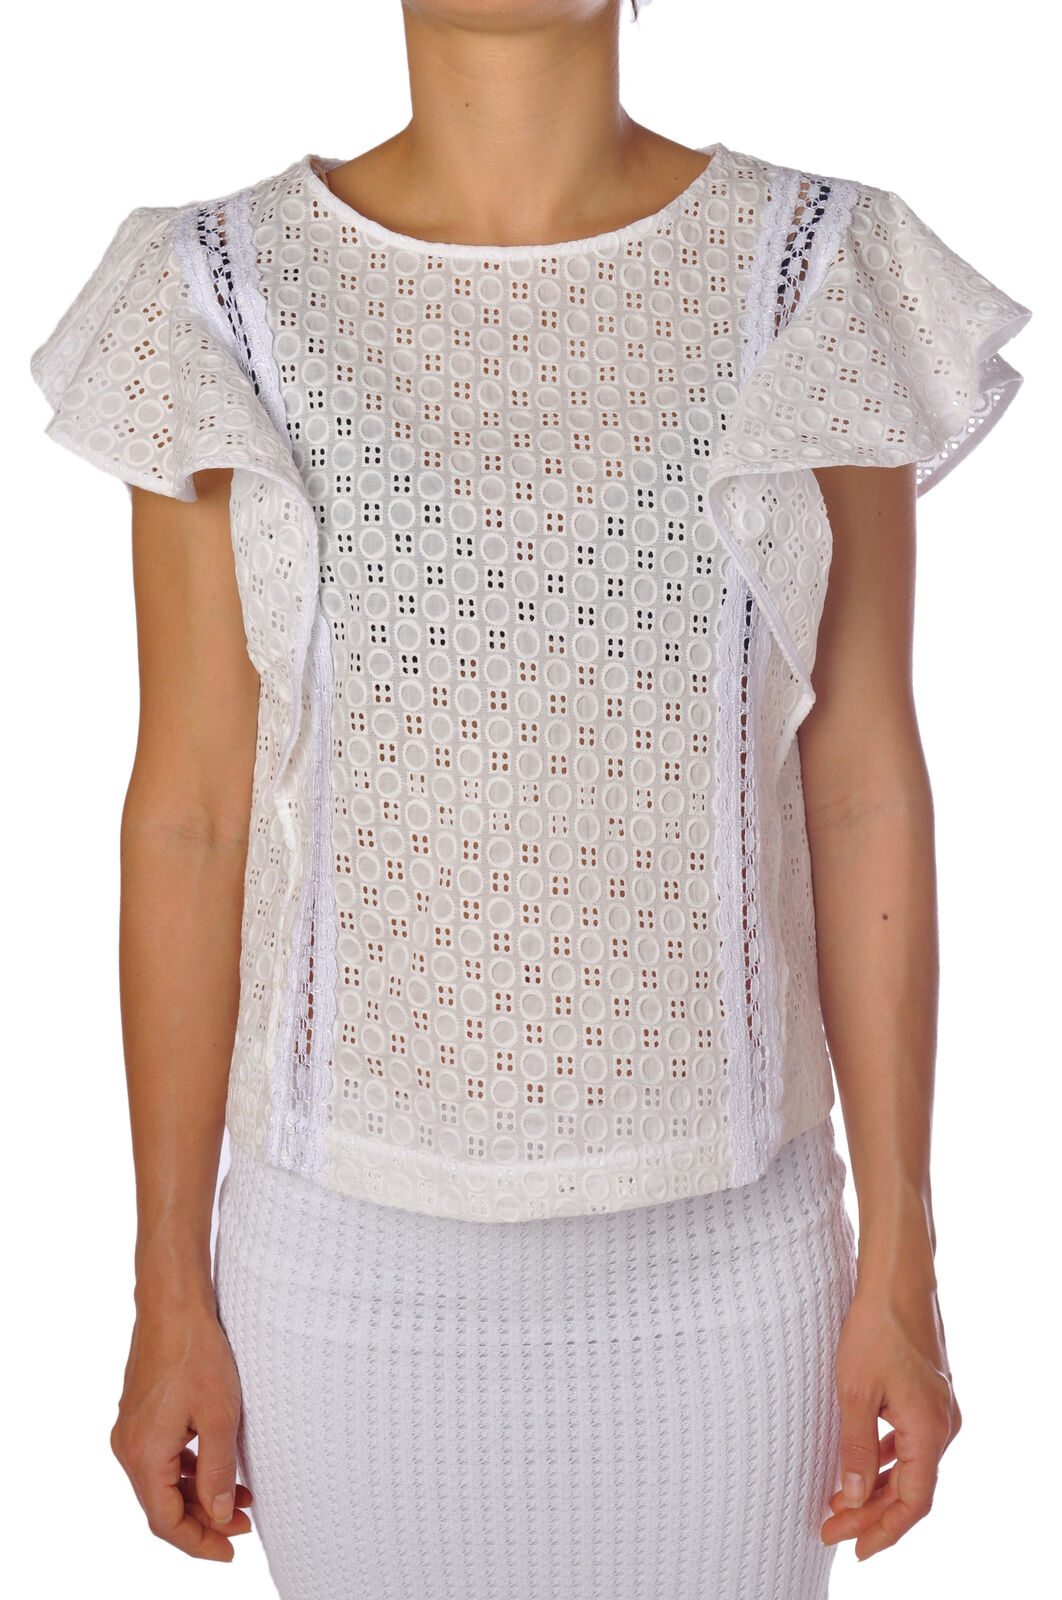 Rosao - Shirts-Blouses - woman - Blau - 803018C184807